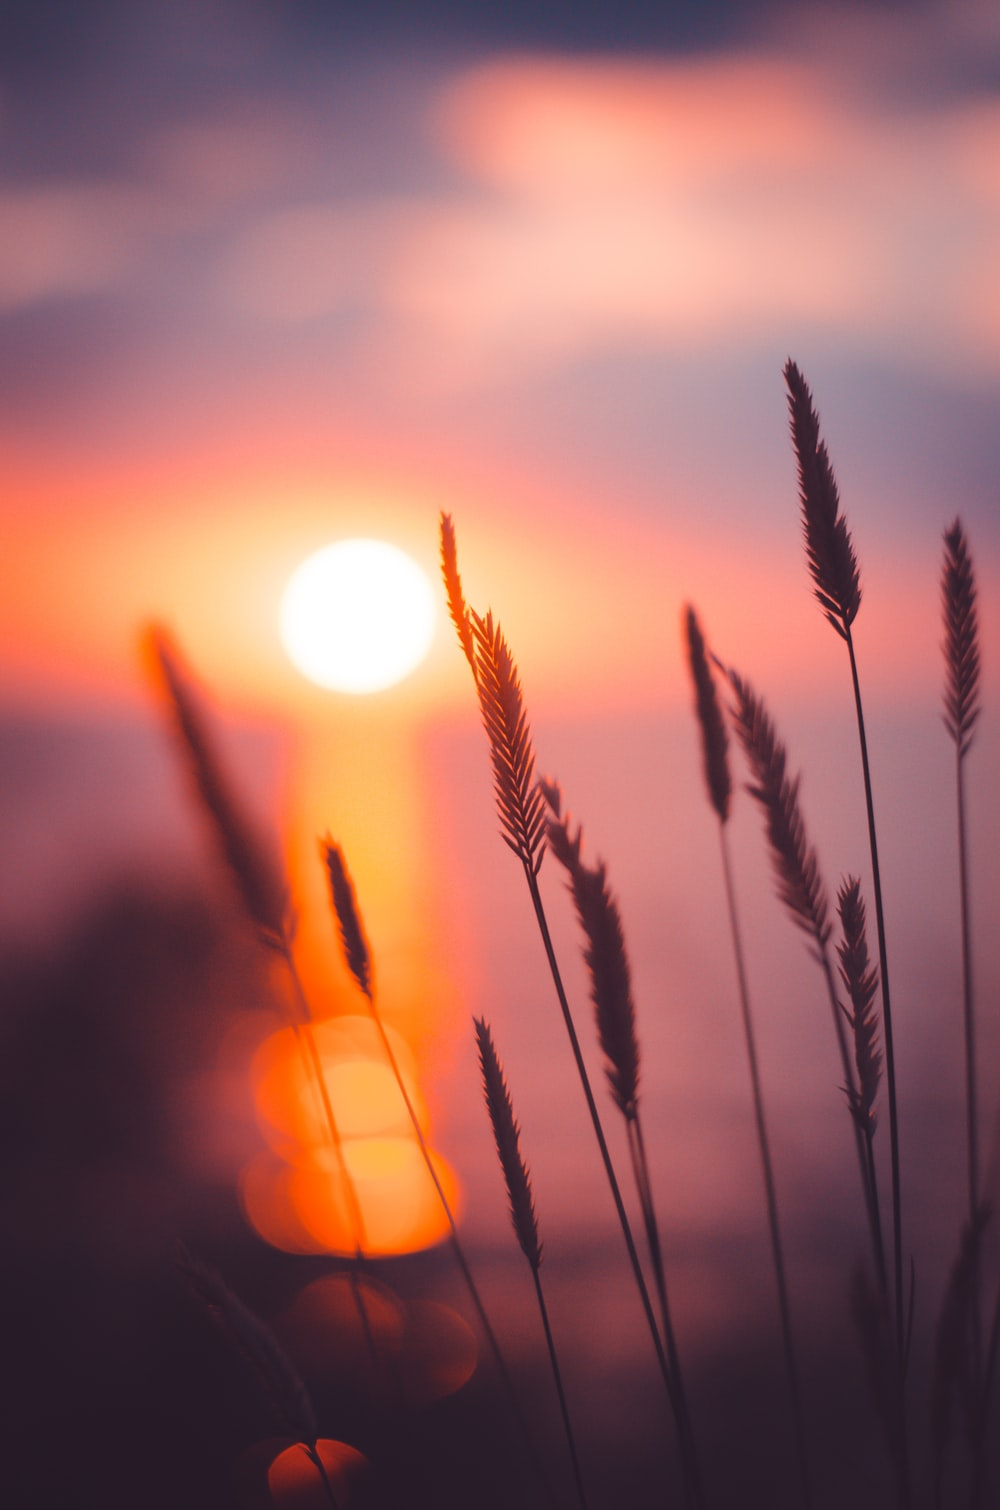 Walpaper 20 Best Free Walpaper Sunset Grass And